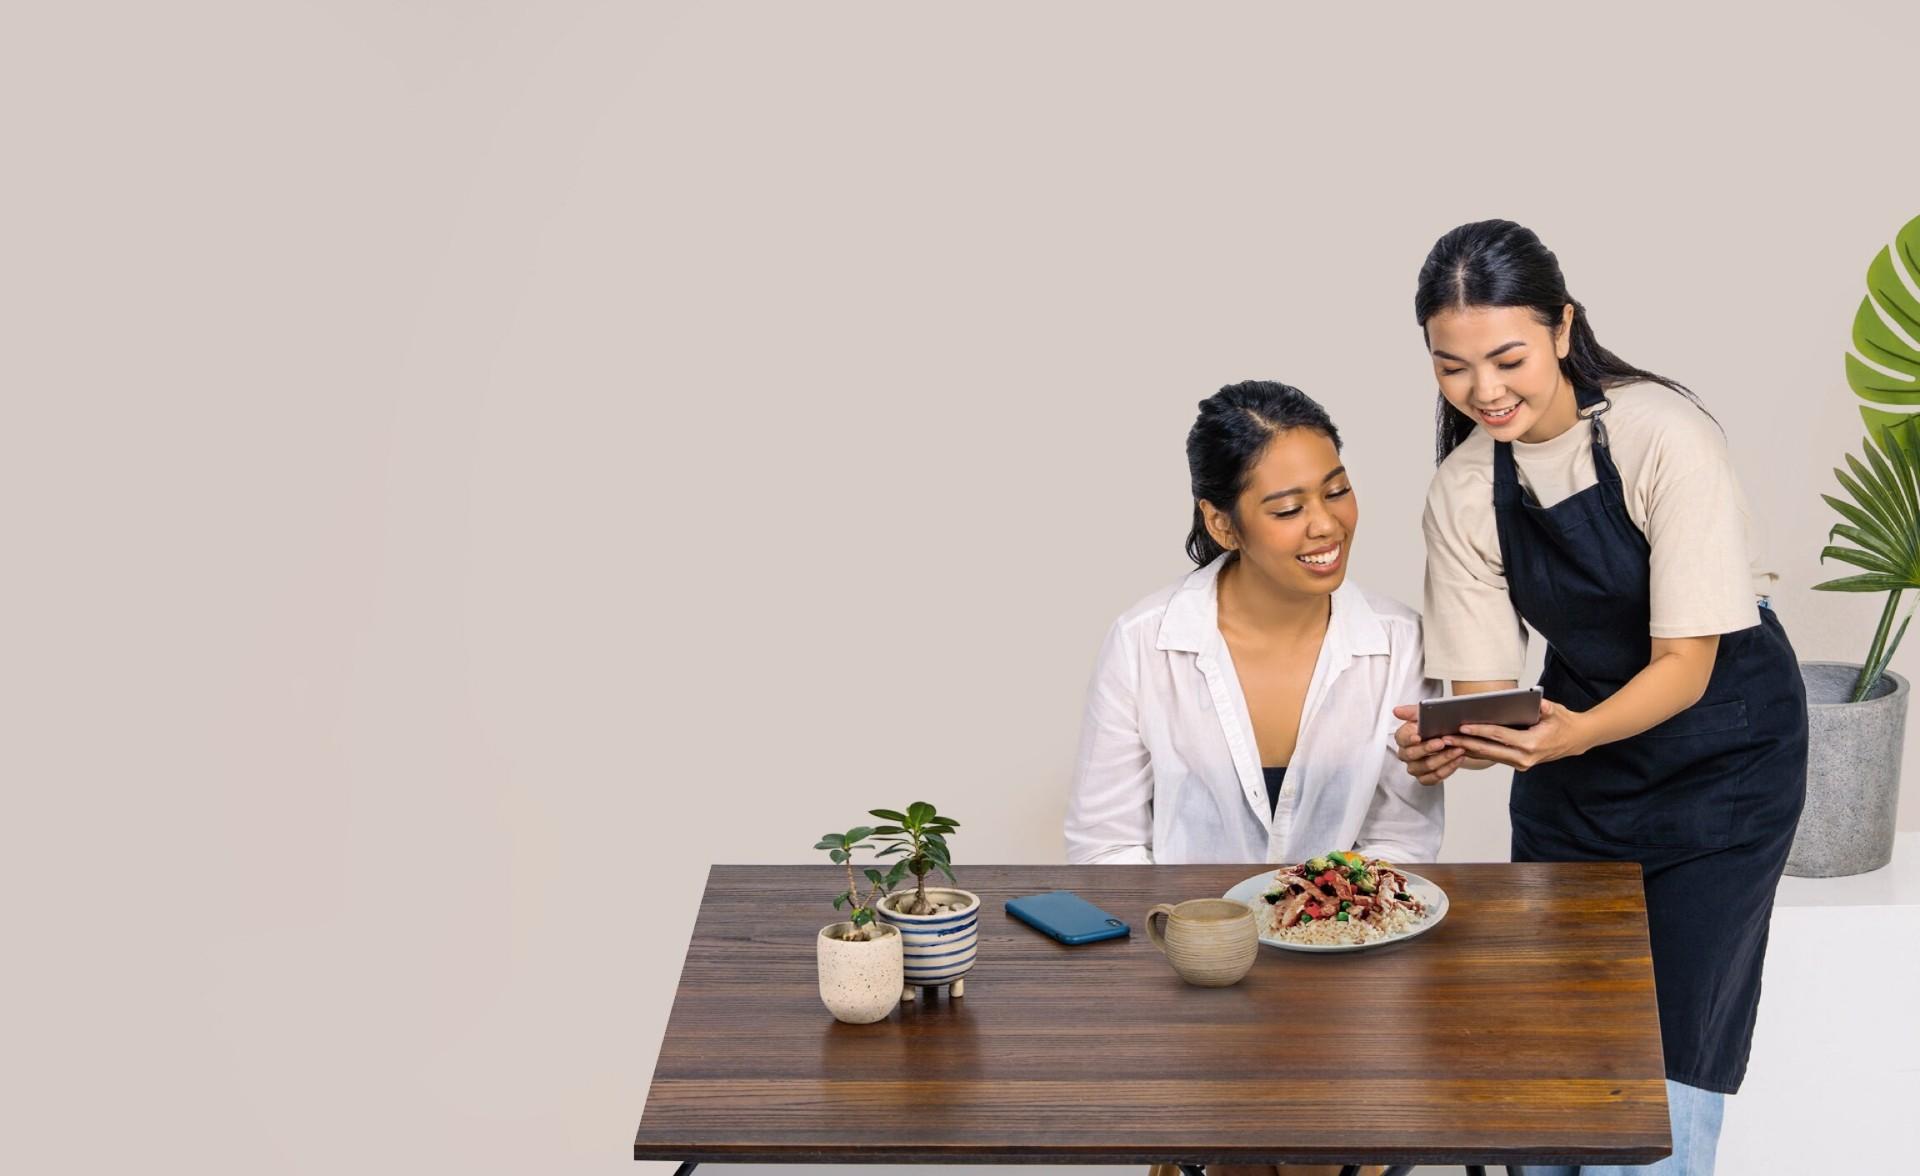 Pelayan di sebuah restoran cepat saji yang sedang menunjukkan aplikasi Moka ke pelanggan yang ingin membayar tagihan terpisah